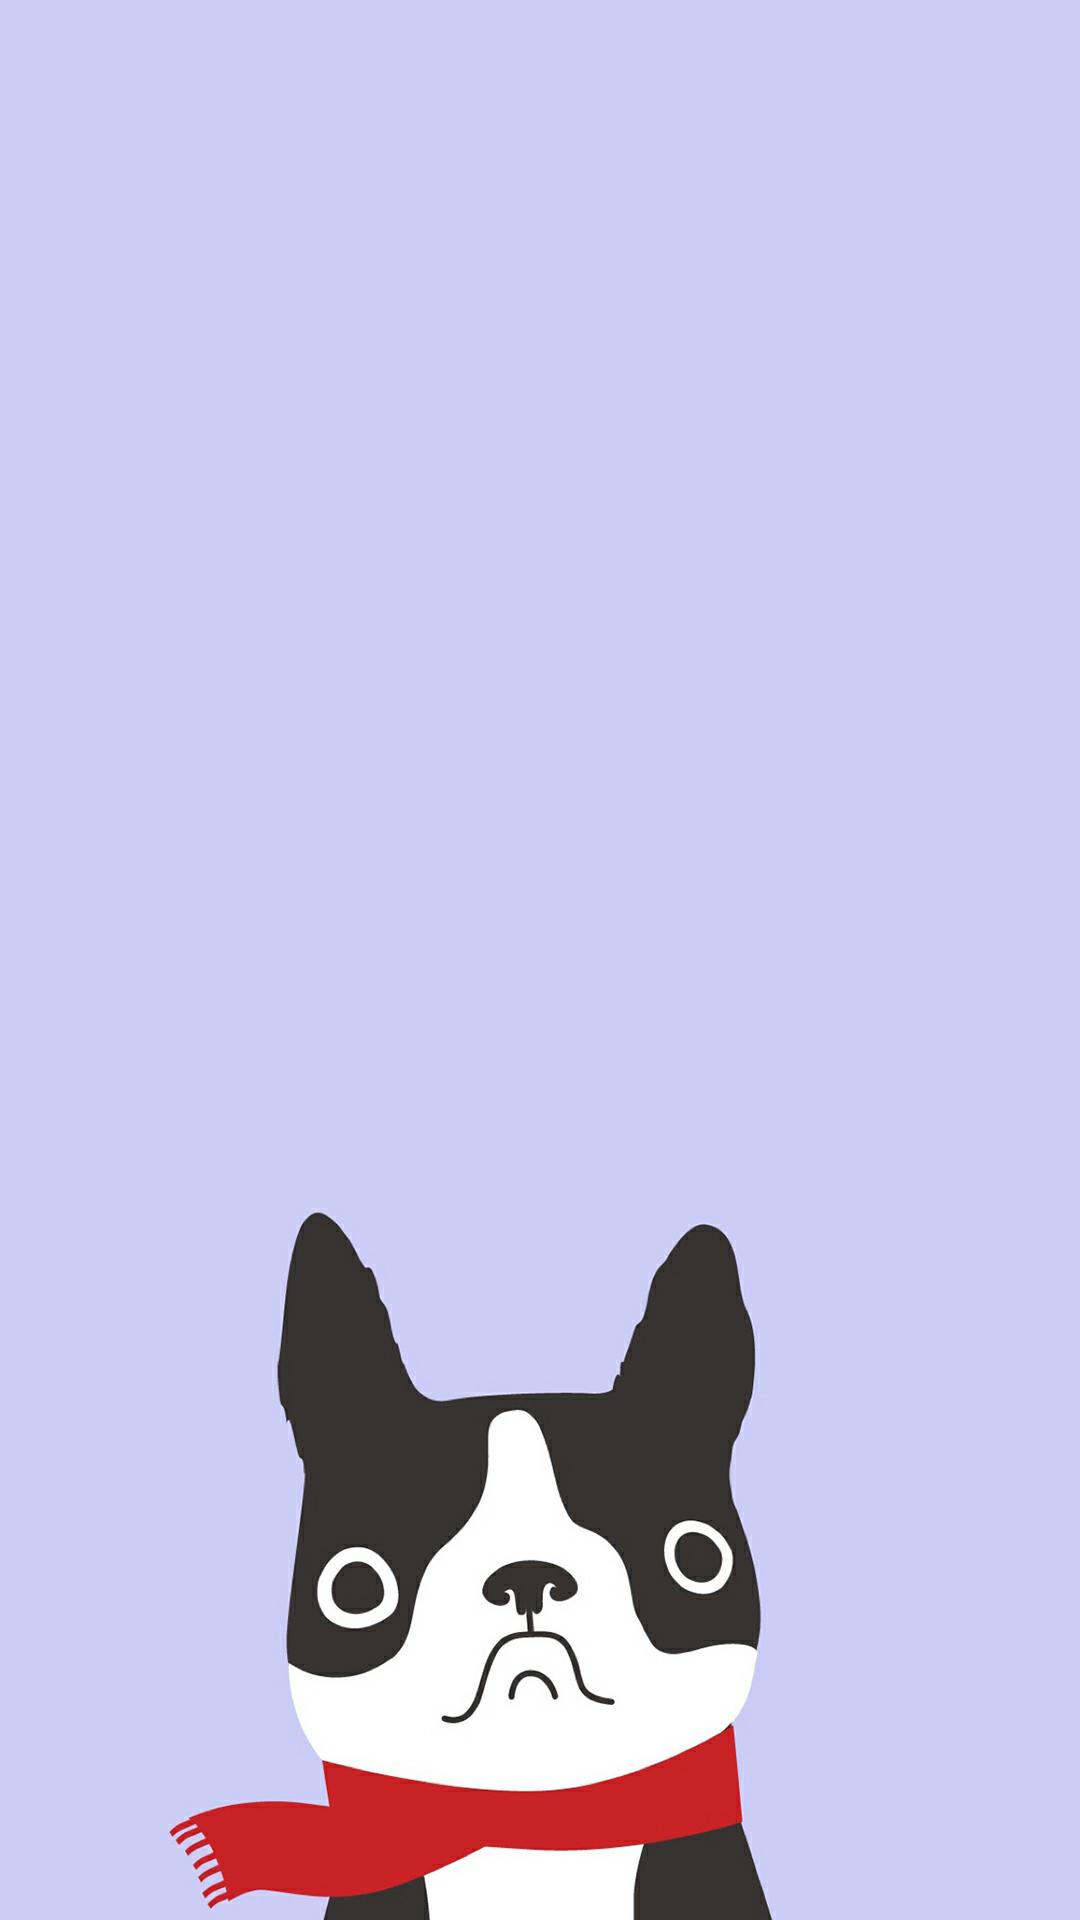 Wallpaper Homescreen Lockscreen Animal Dog Pet More Hd Wallpaper Please Download Awbhd động Vật